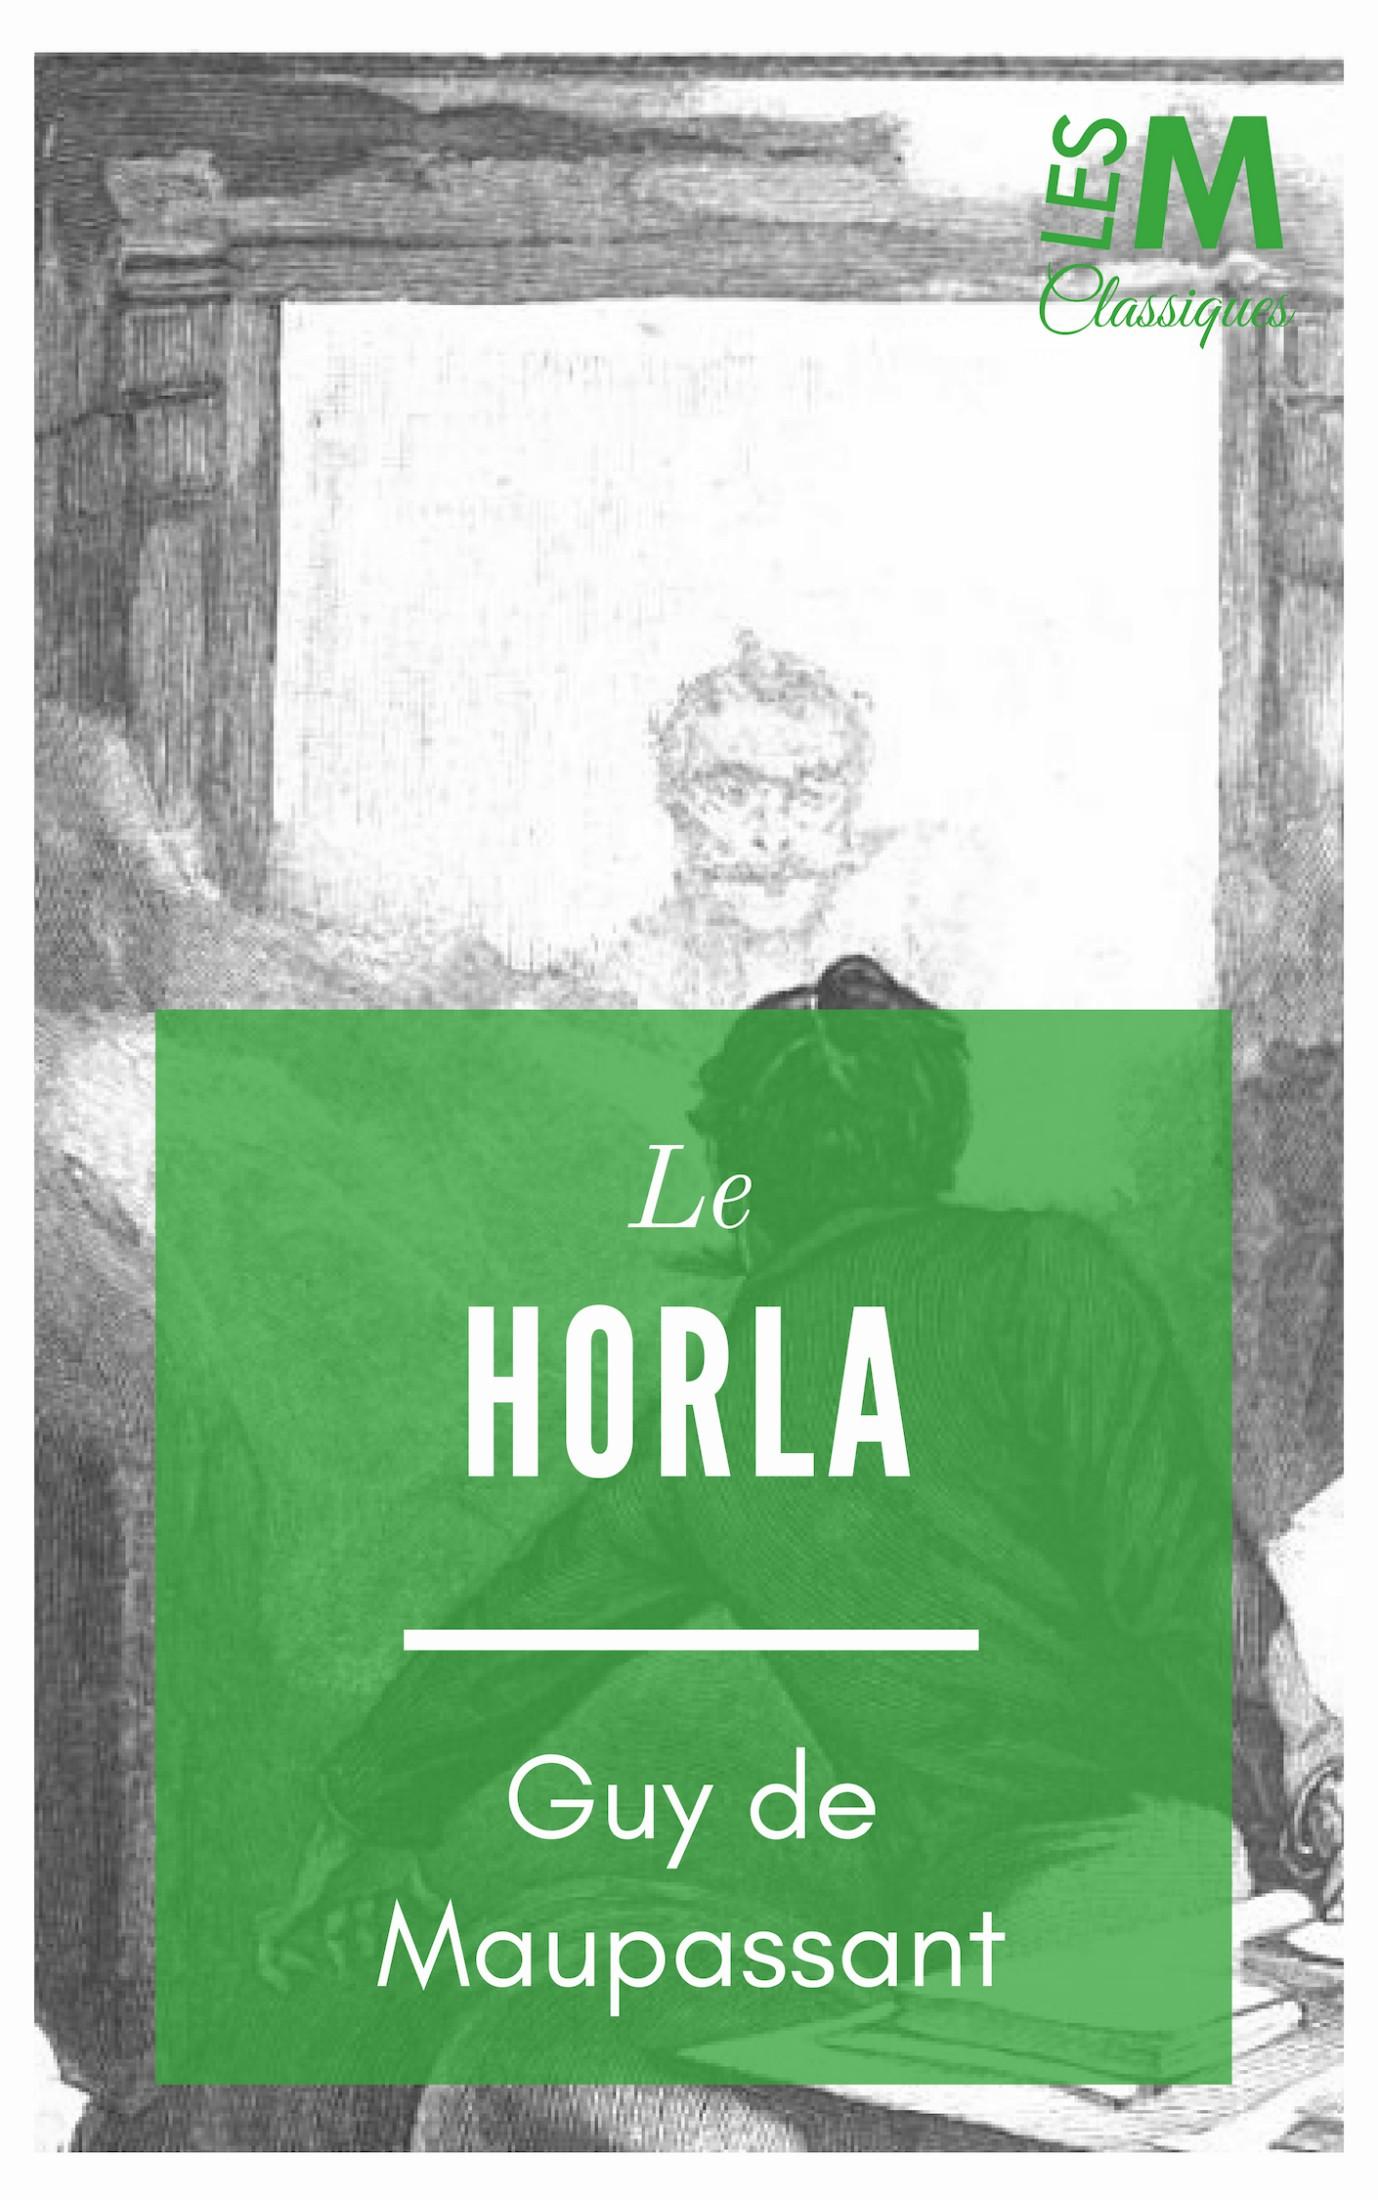 Le Horla (1887)